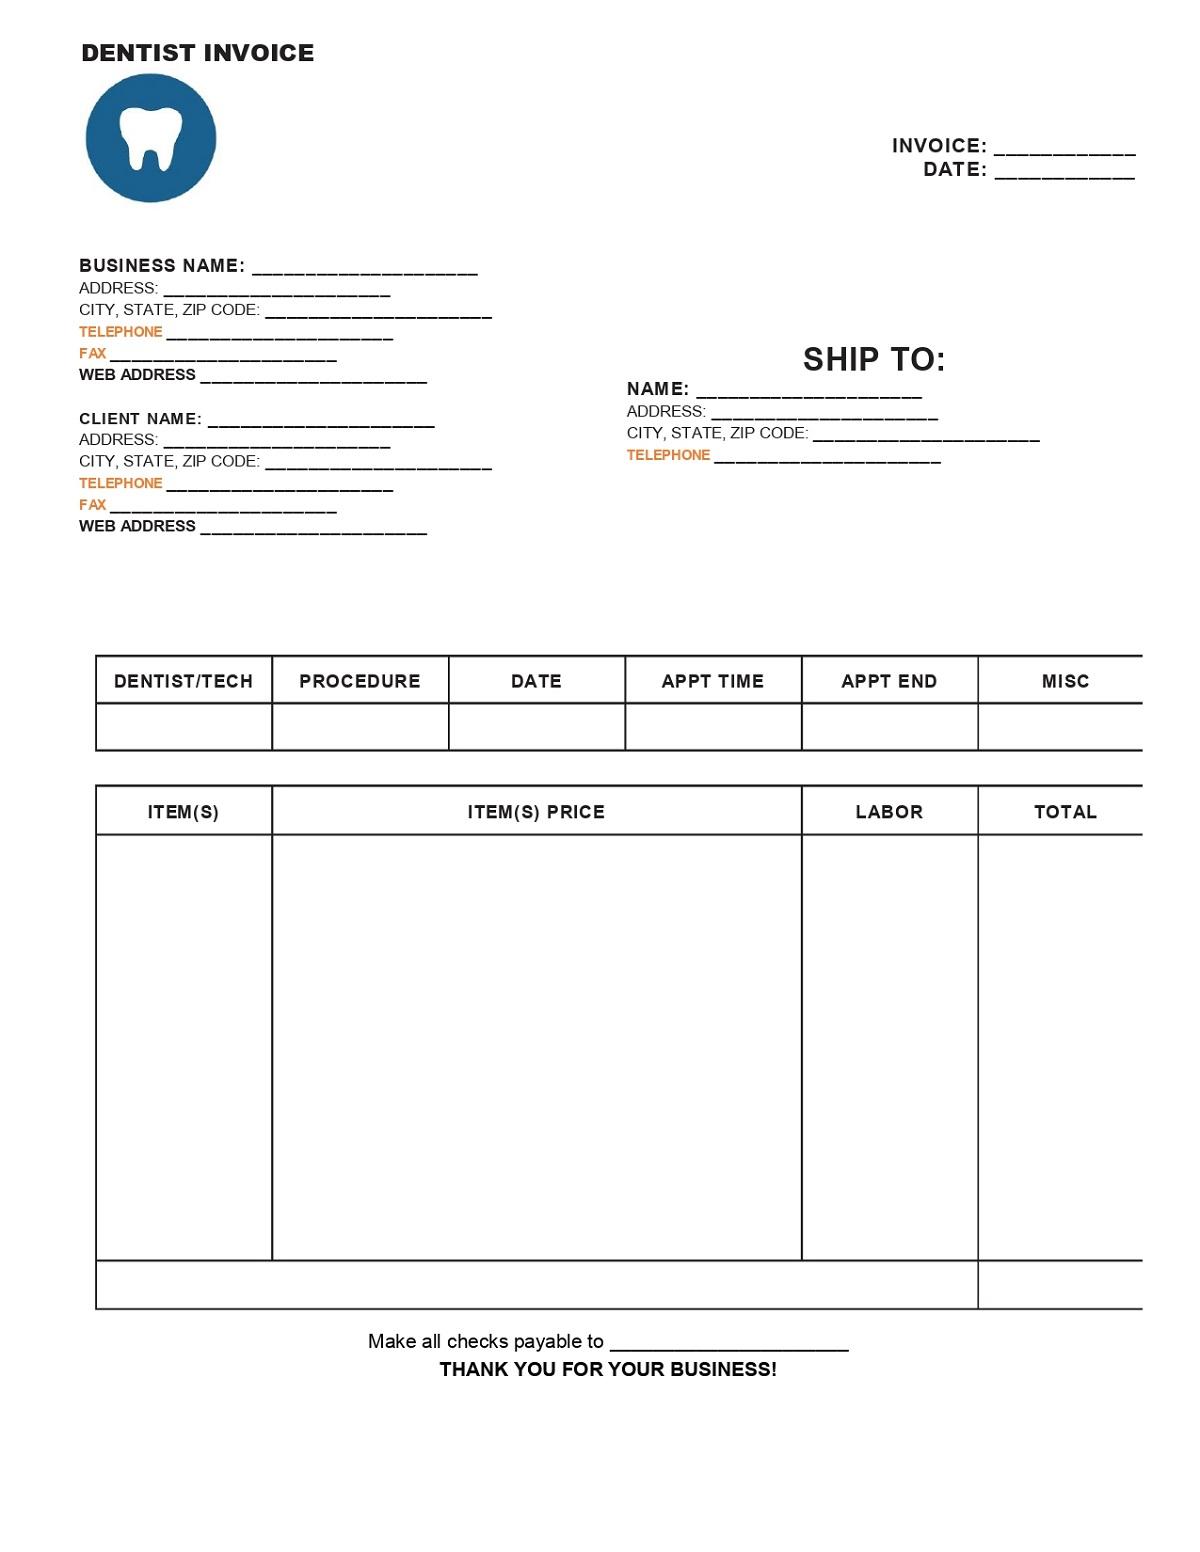 Dental Invoice Form